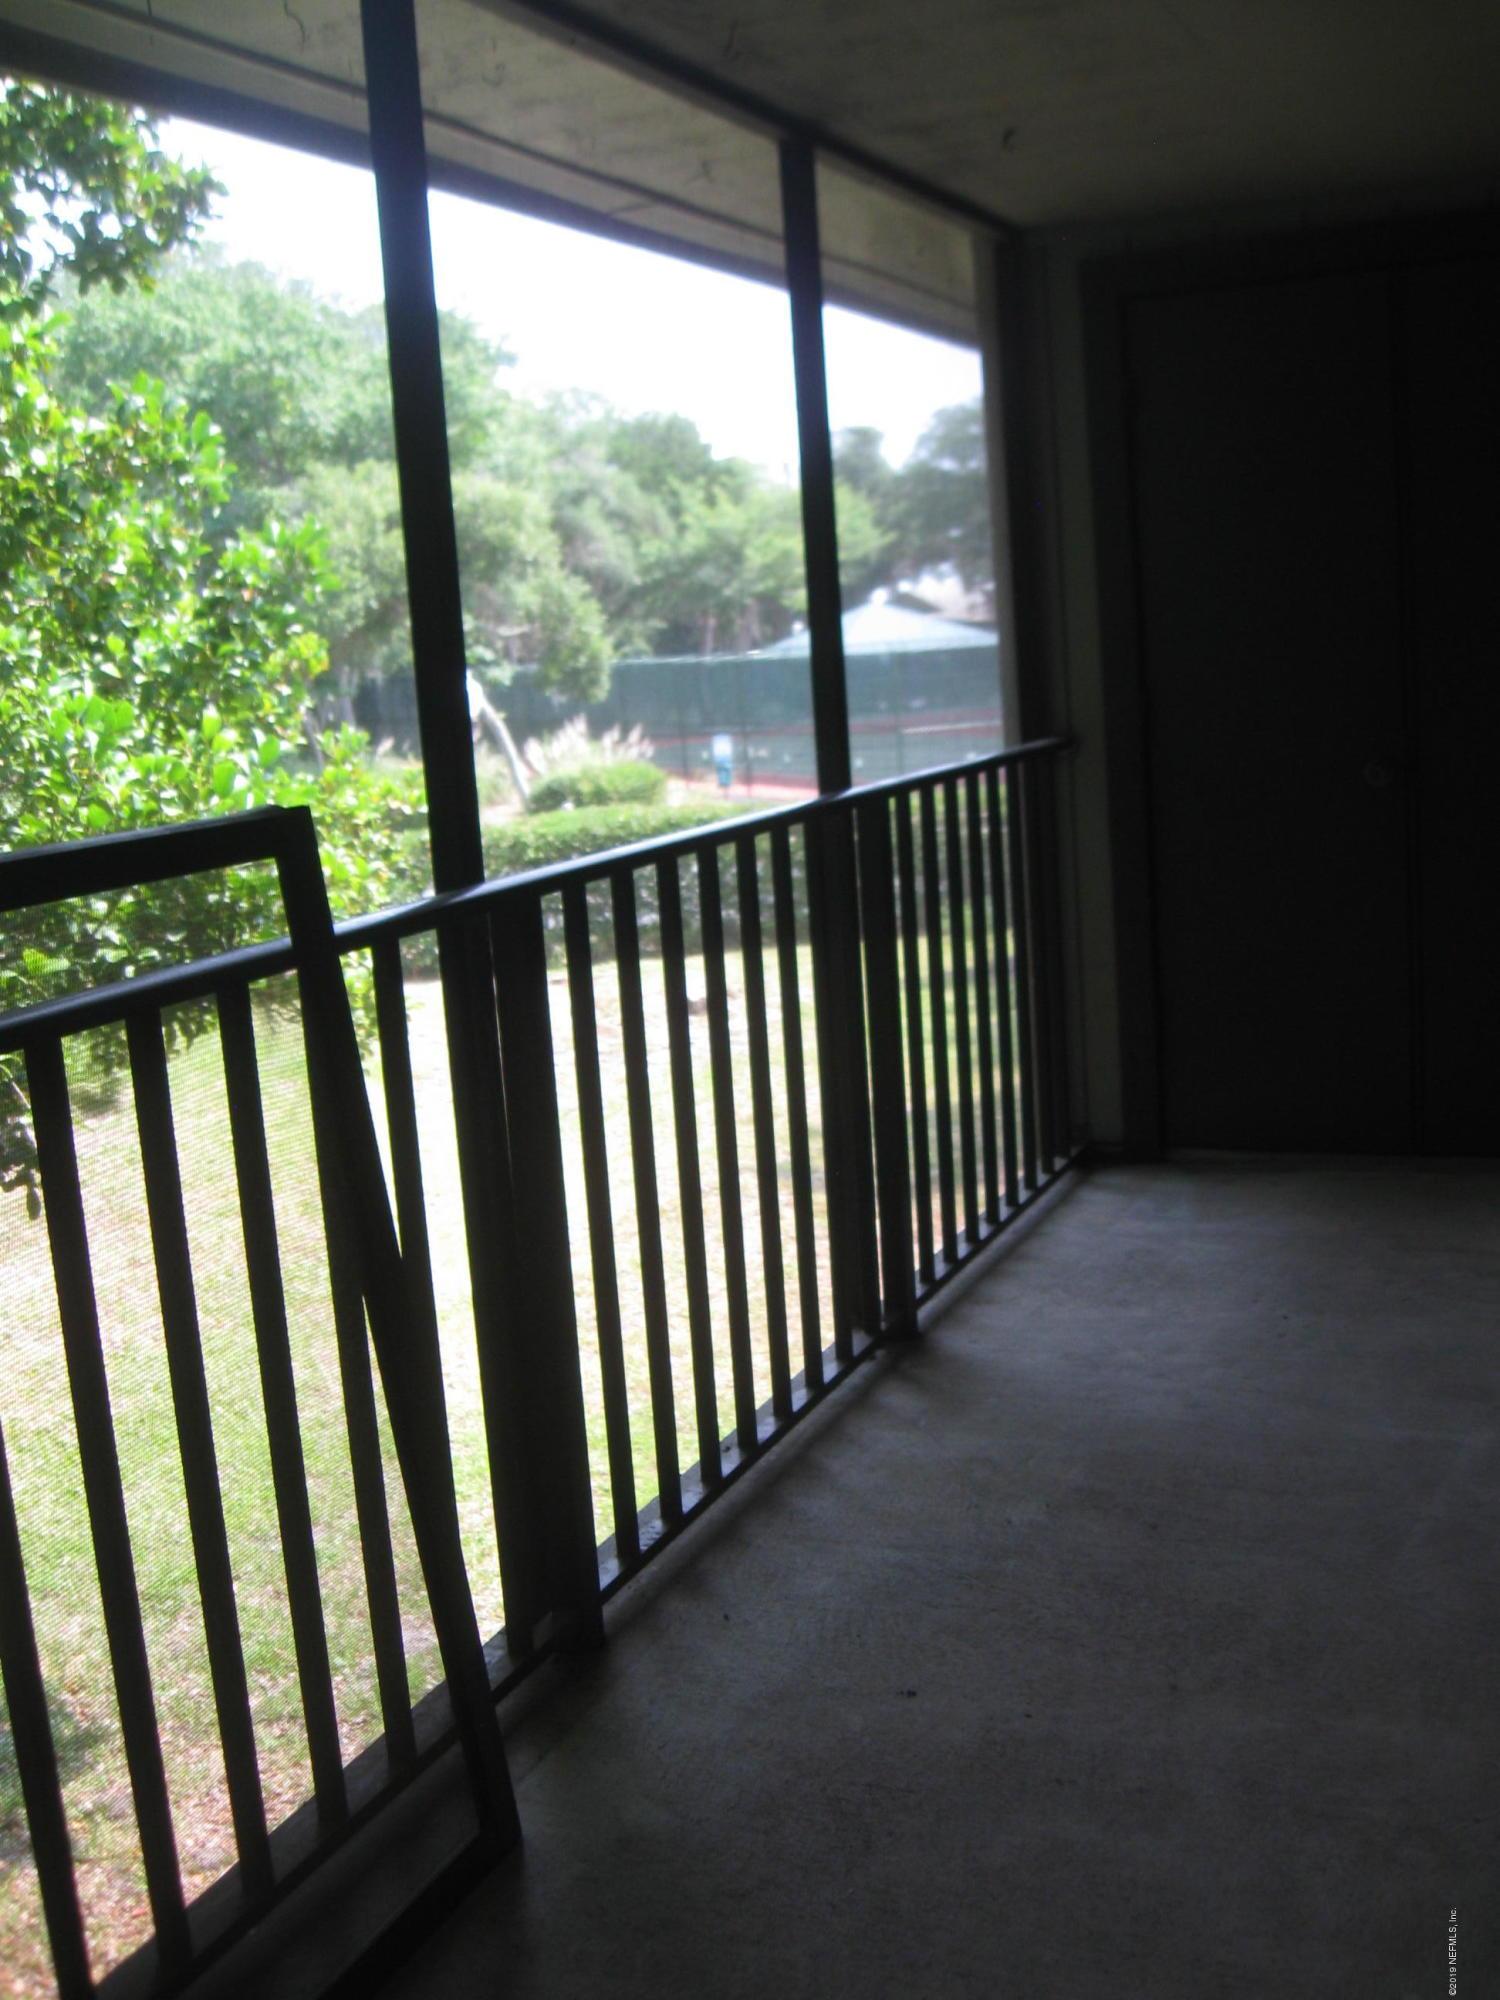 30 CATALONIA, ST AUGUSTINE, FLORIDA 32086, 2 Bedrooms Bedrooms, ,1 BathroomBathrooms,Condo,For sale,CATALONIA,997769